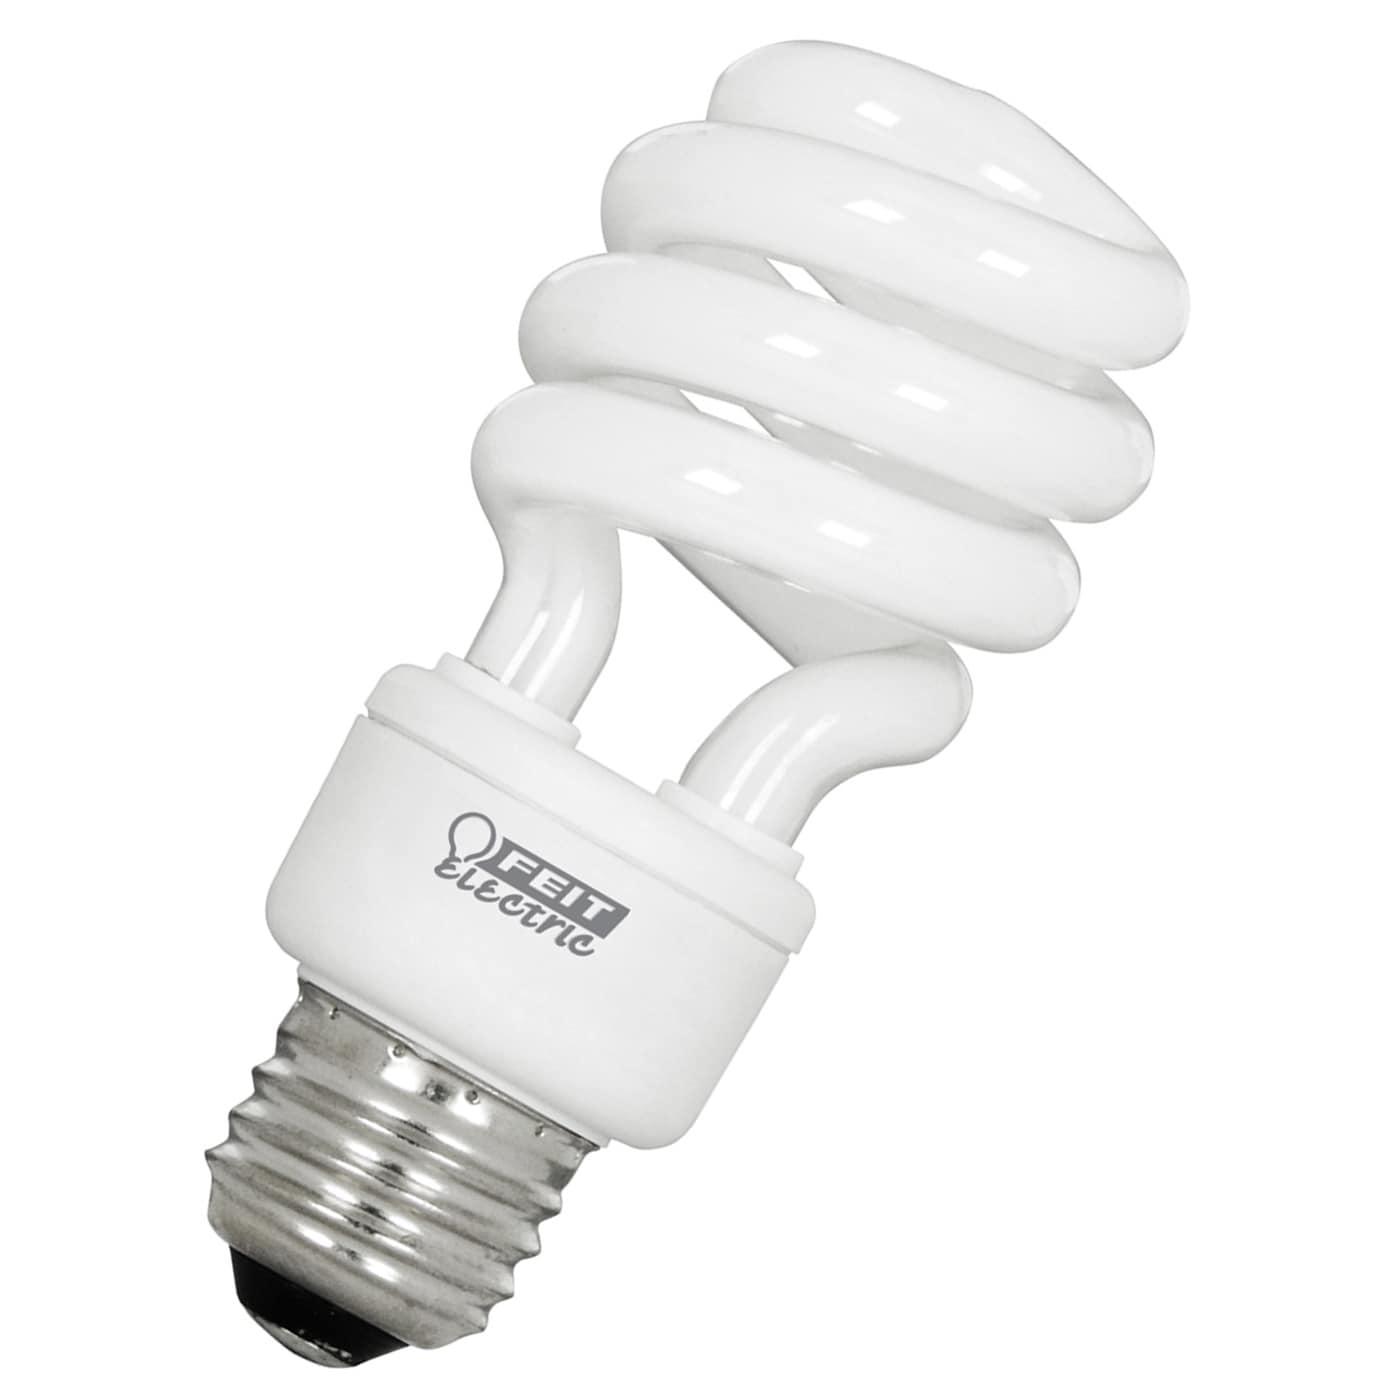 FEIT Electric Ecobulb CFL Bulb 13 watts 900 lumens 2 in. ...